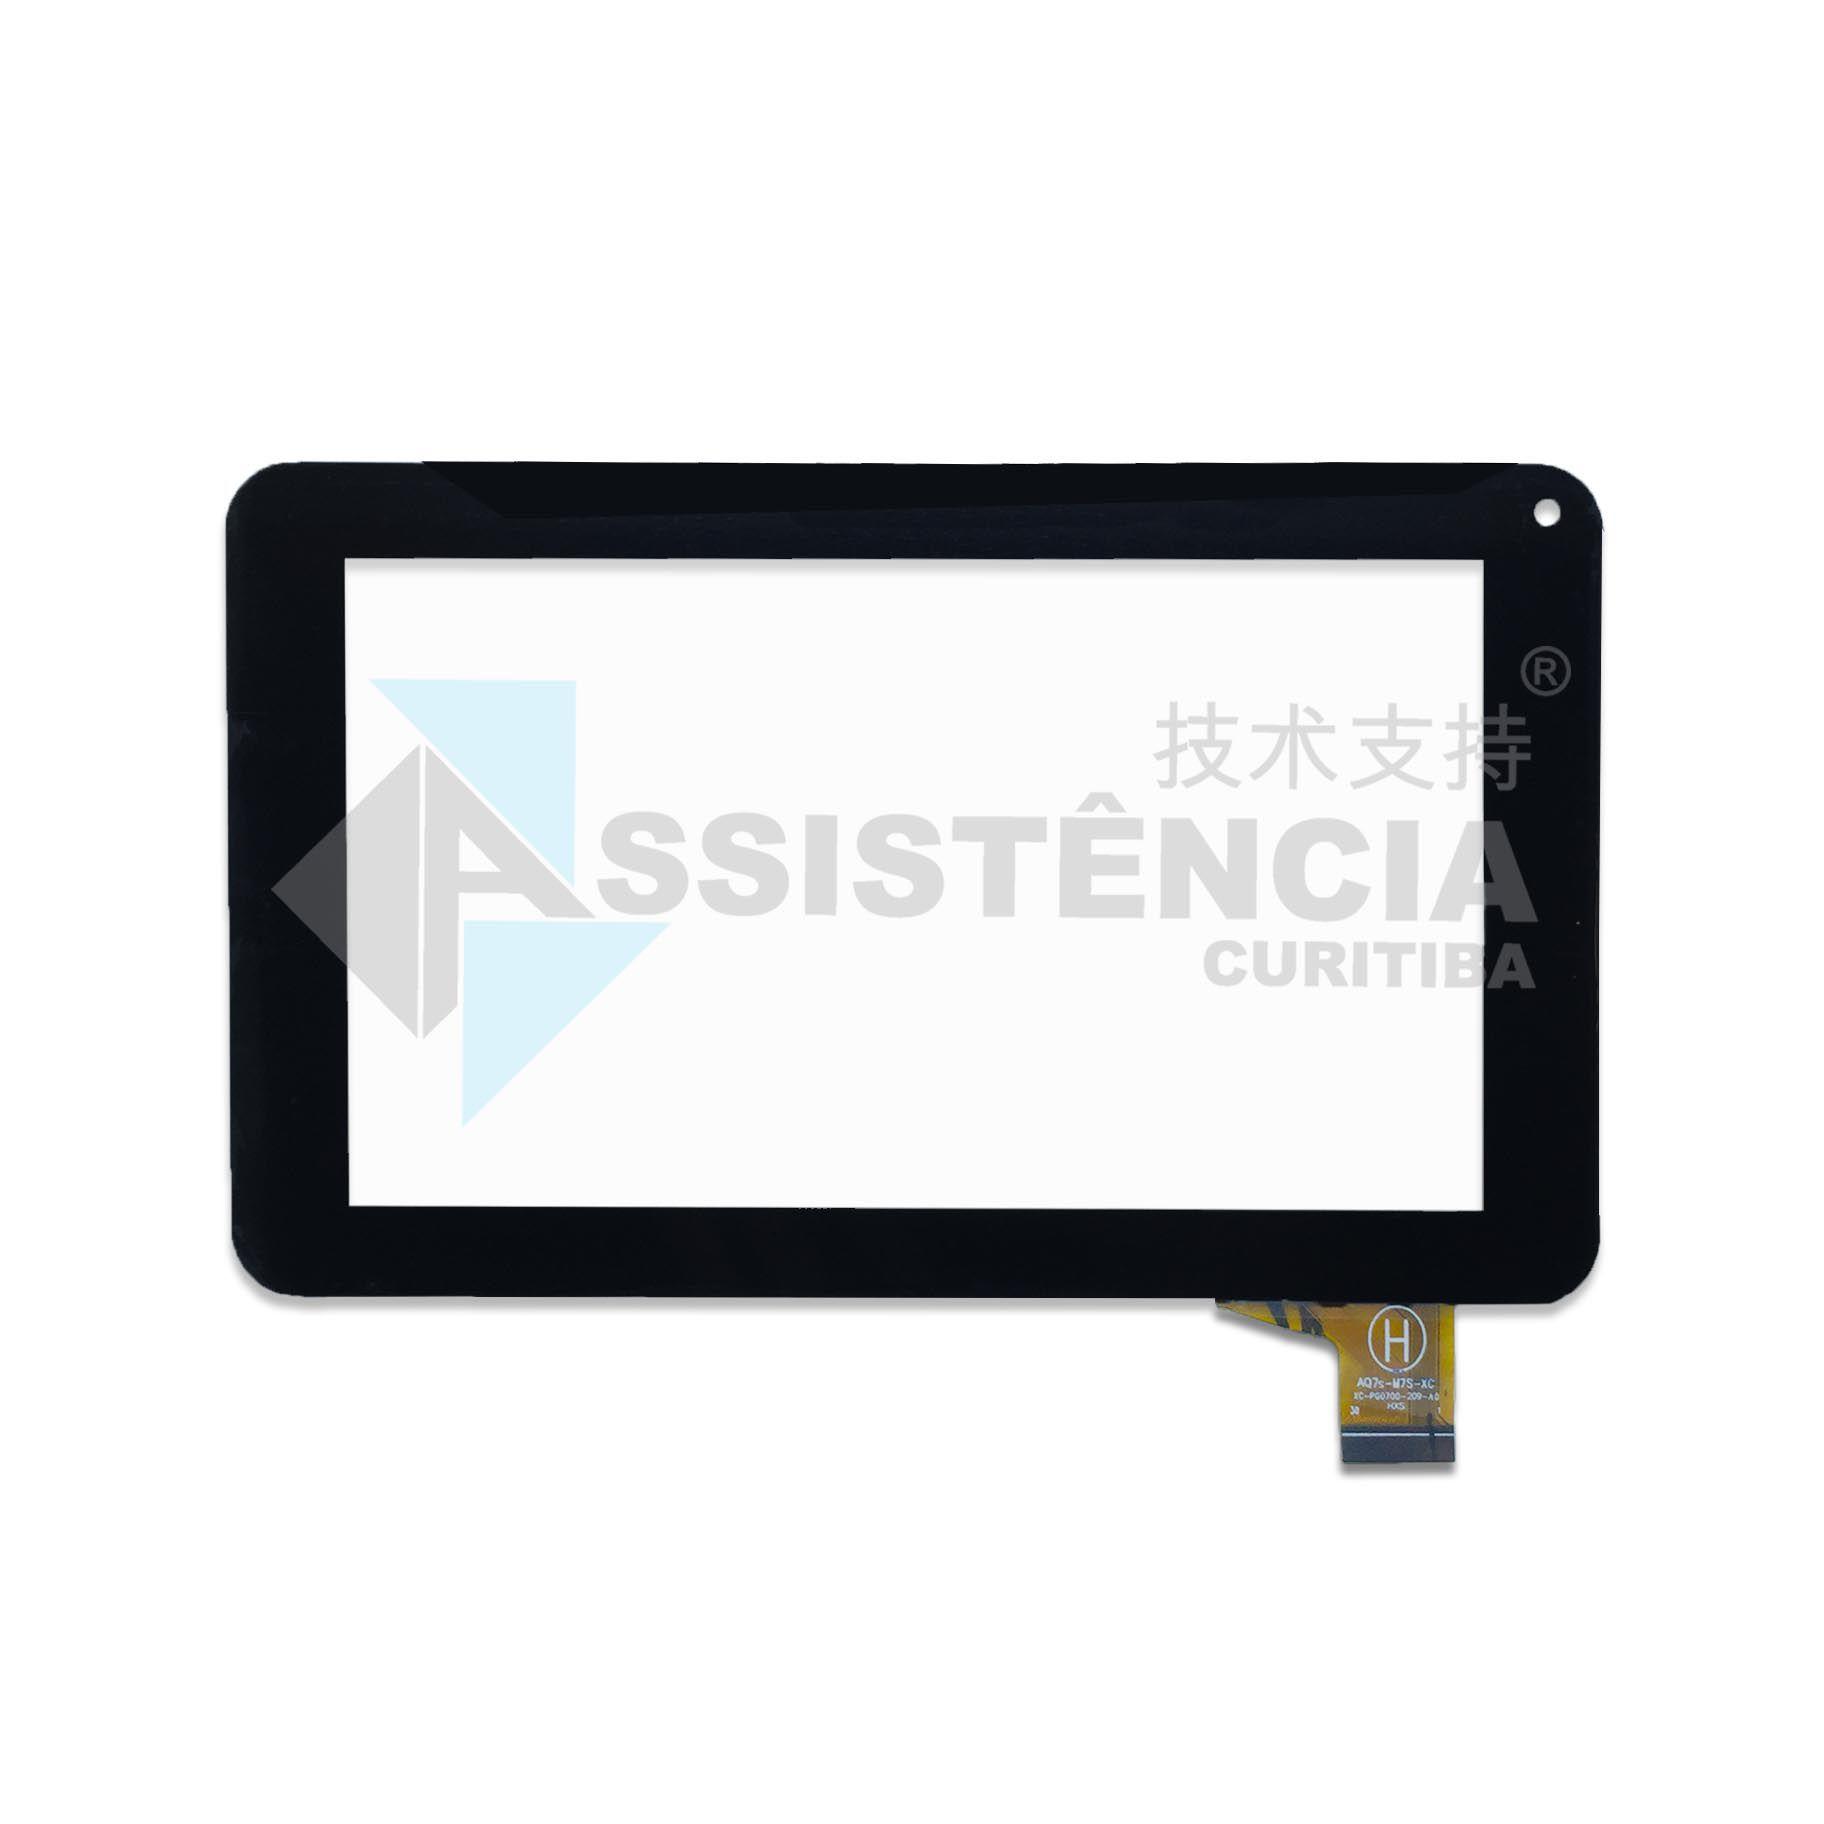 Tela Touch Dl I -Style Pis T71 Brat71 Preto